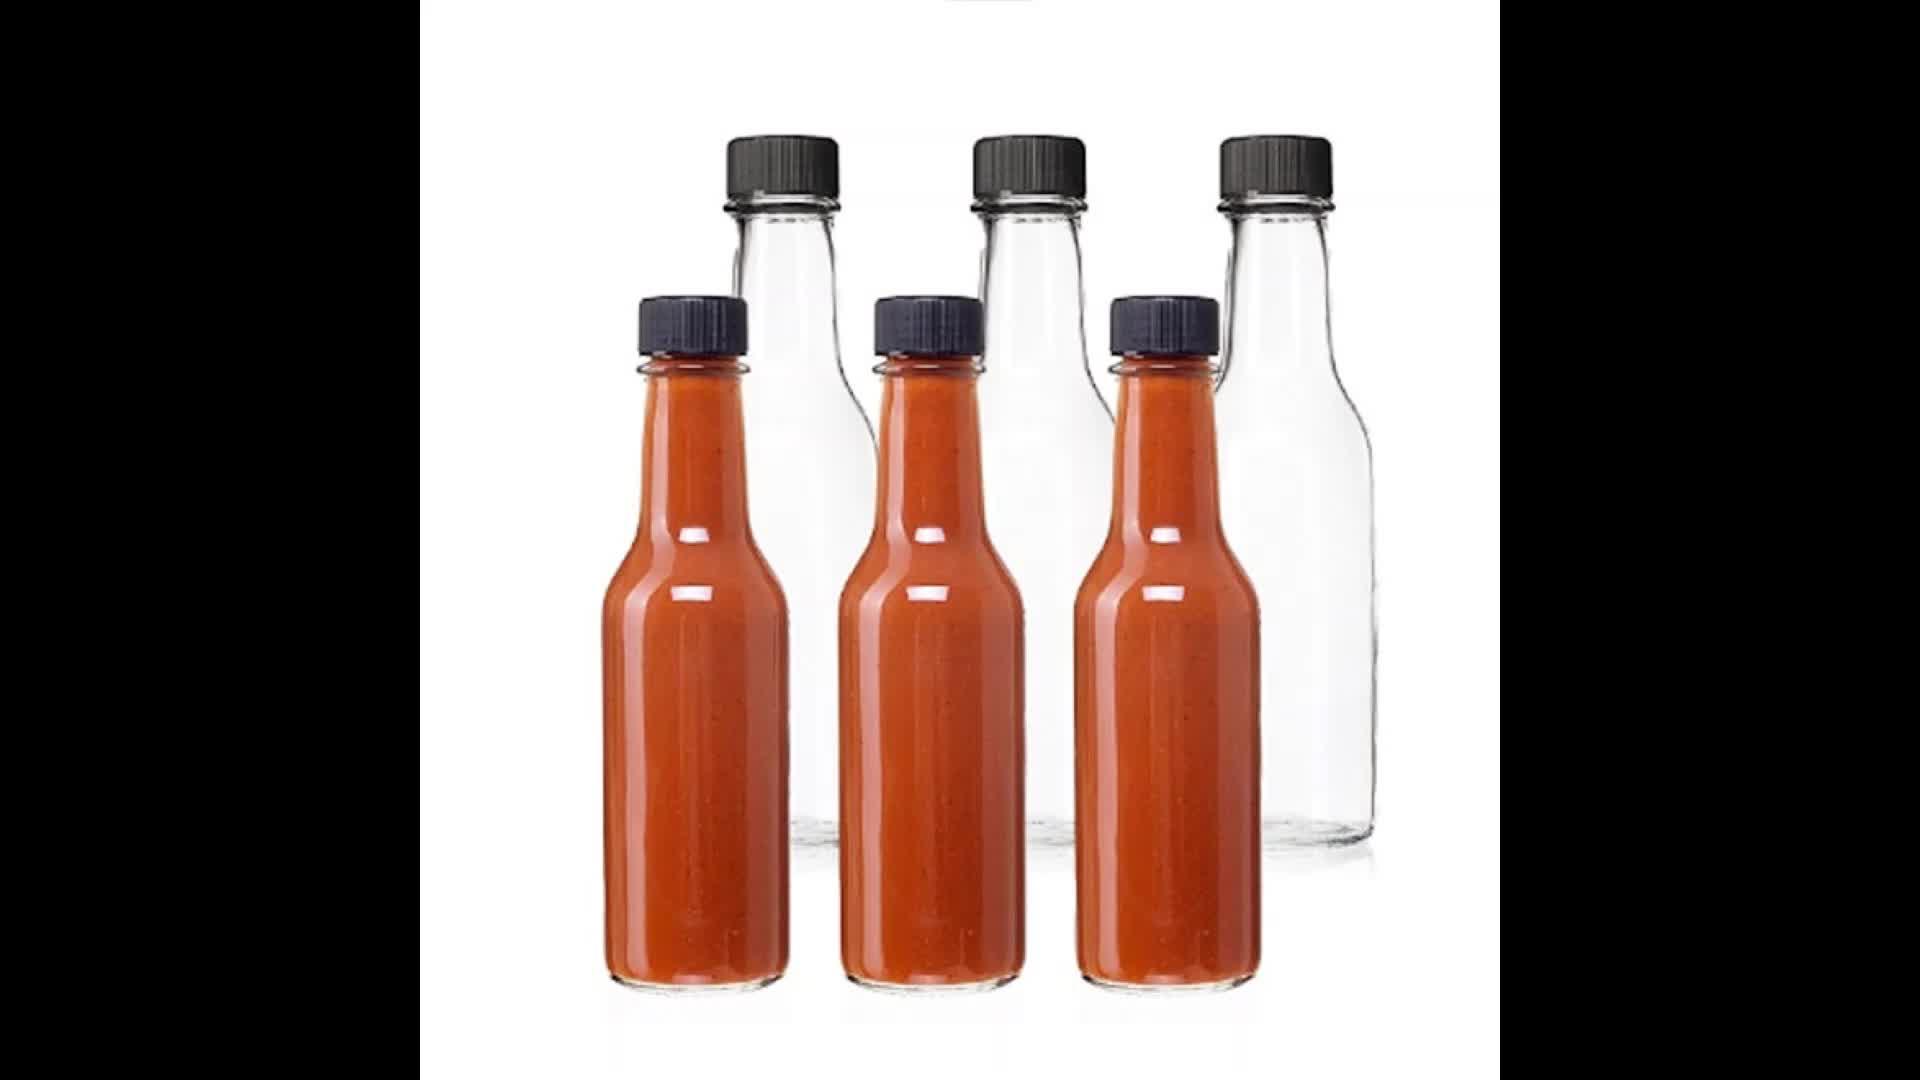 150ml 5oz ketchup barbecue piment sauce woozy bouteille en verre alimentaire